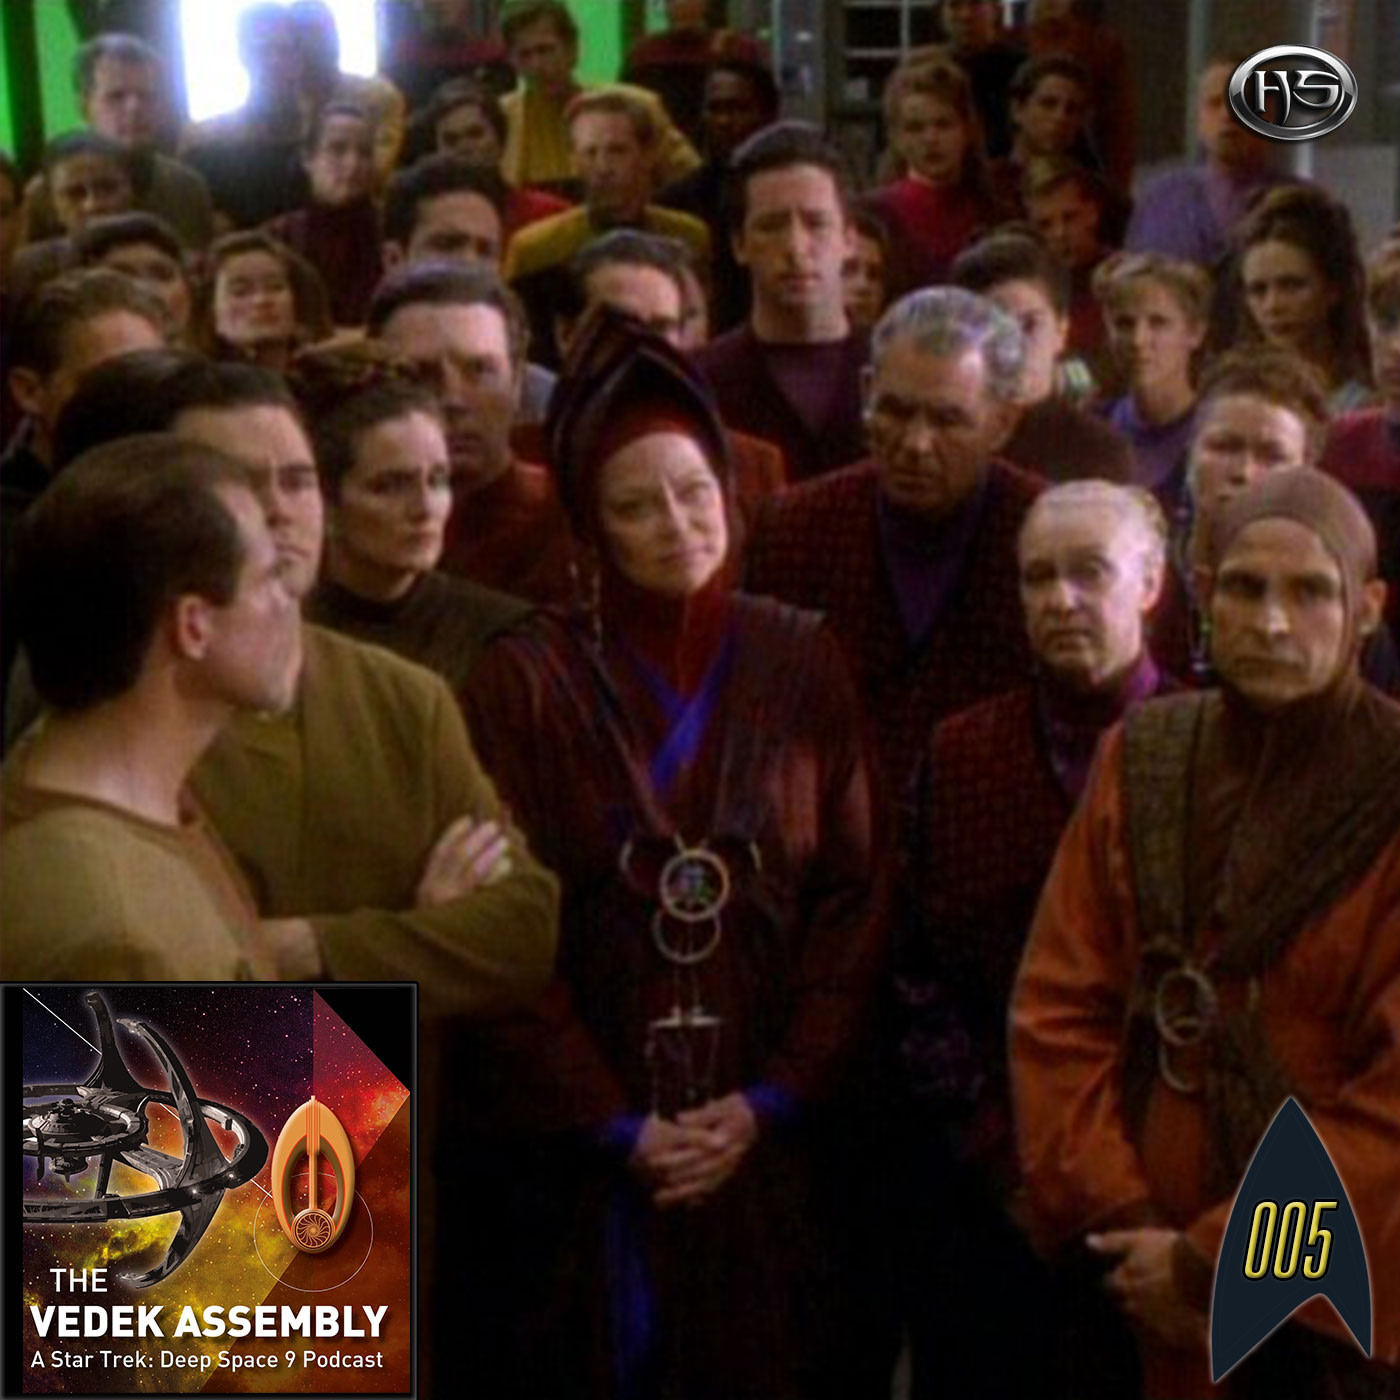 The Vedek Assembly Episode 5